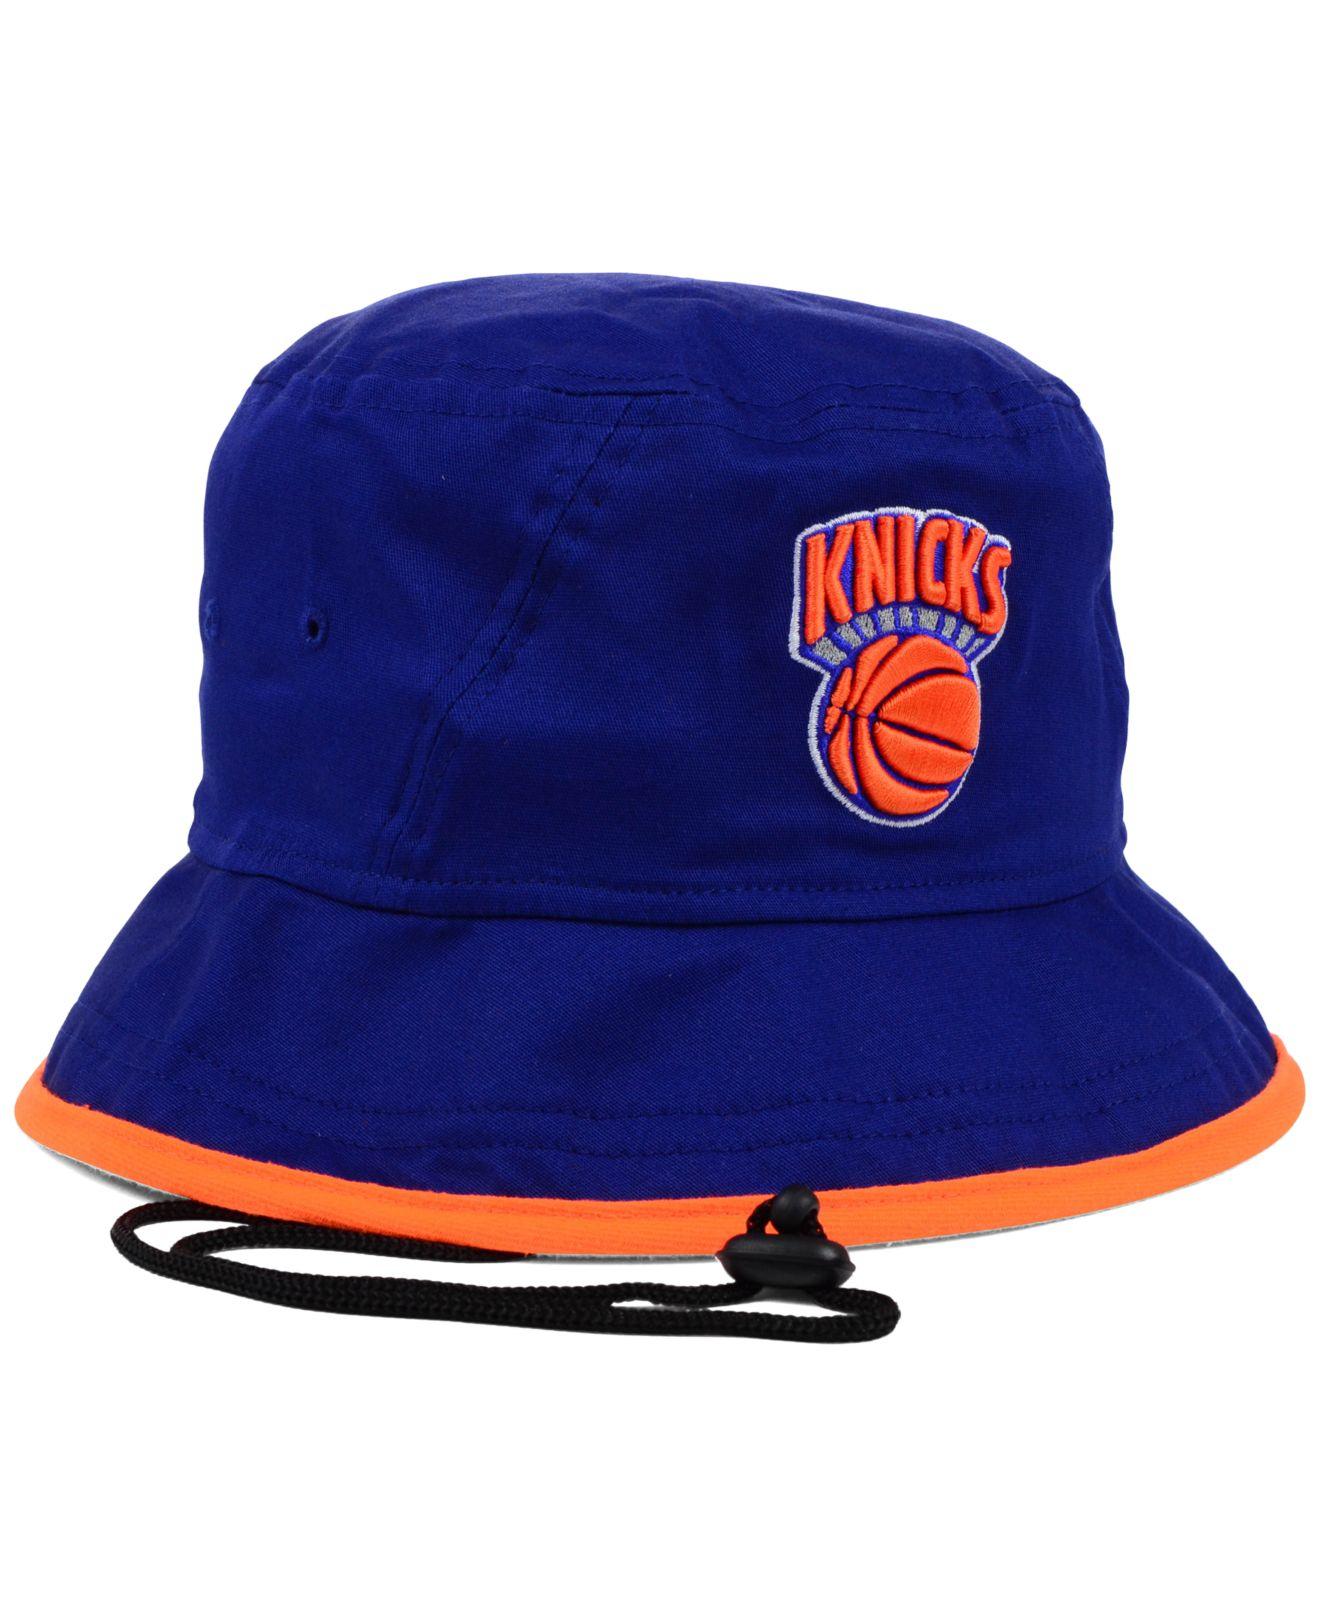 0803772b48c Lyst - KTZ New York Knicks Hardwood Classics Tipped Bucket Hat in ...